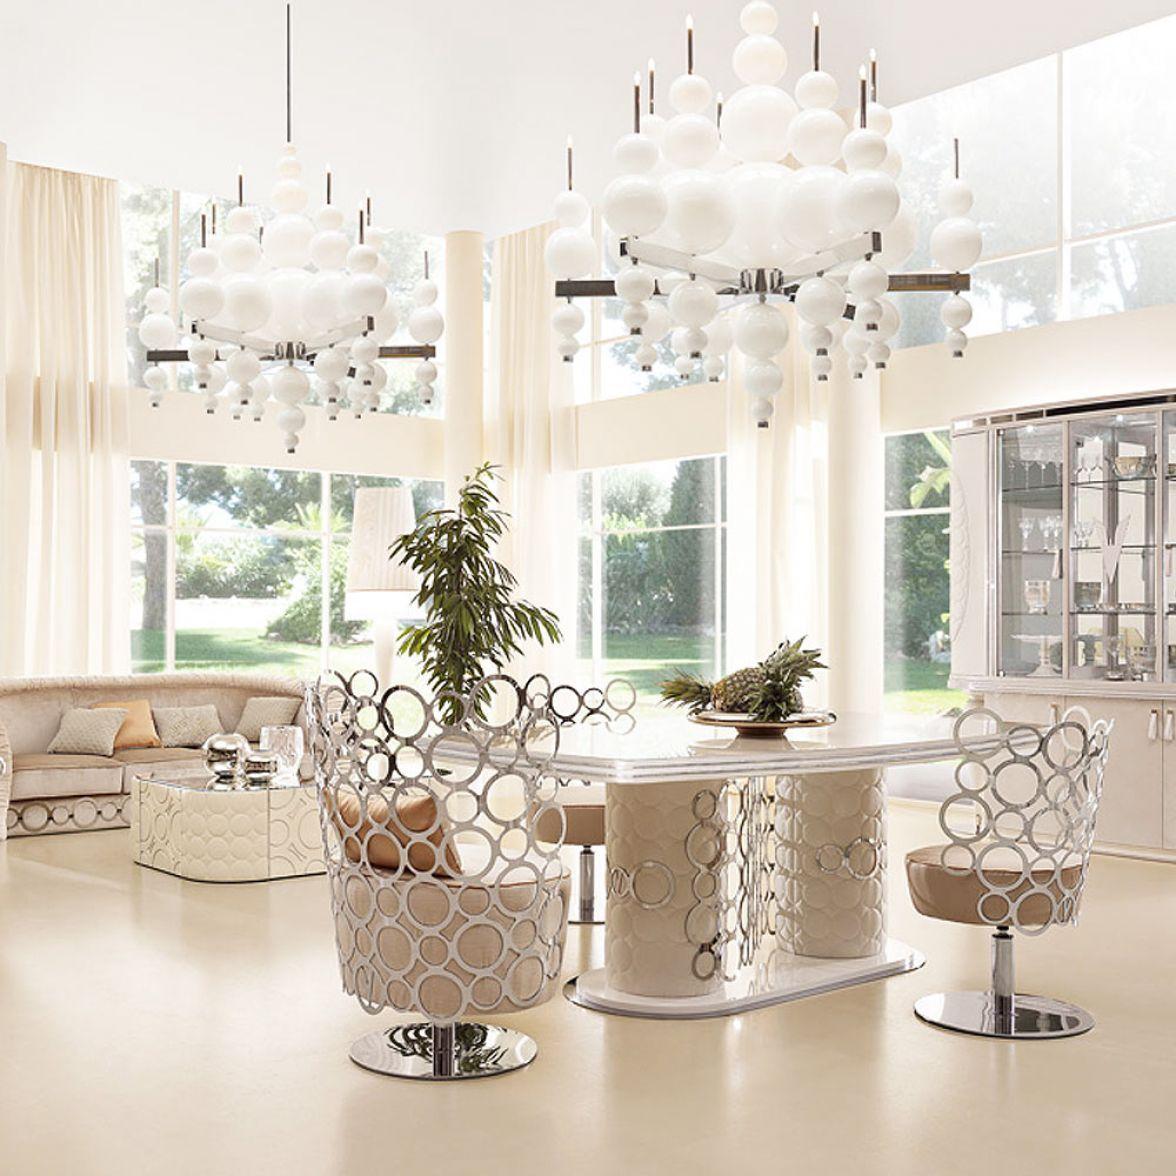 Jaguar Living room